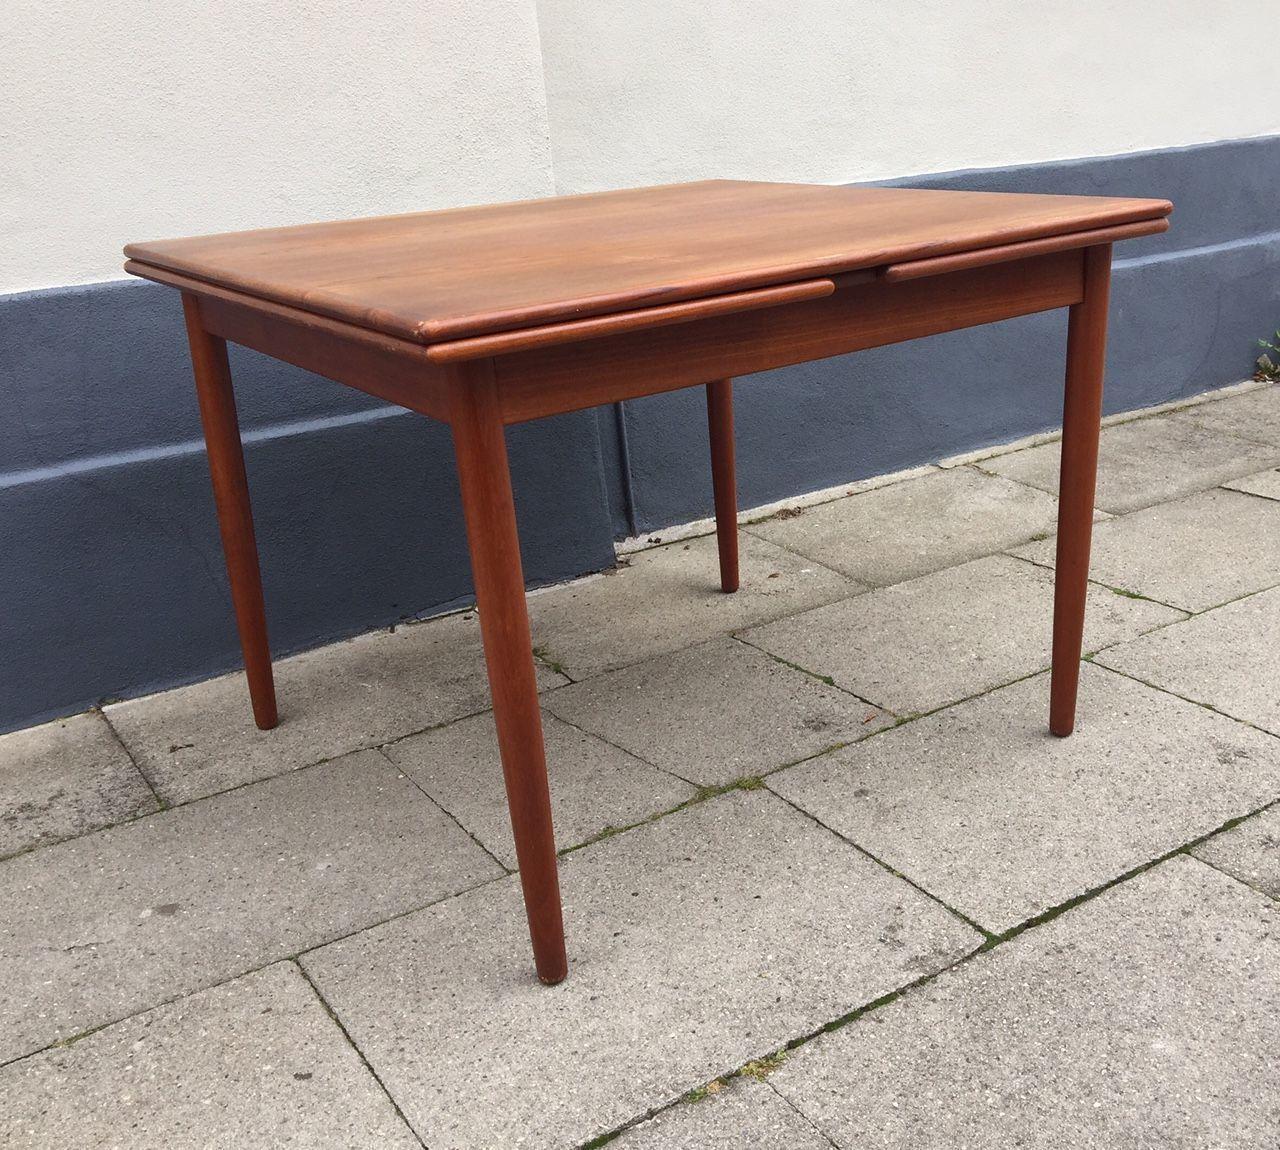 Danish Mid Century Extendable Teak Dining Table From Farstrup 1960s Teak Dining Table Dining Table Teak